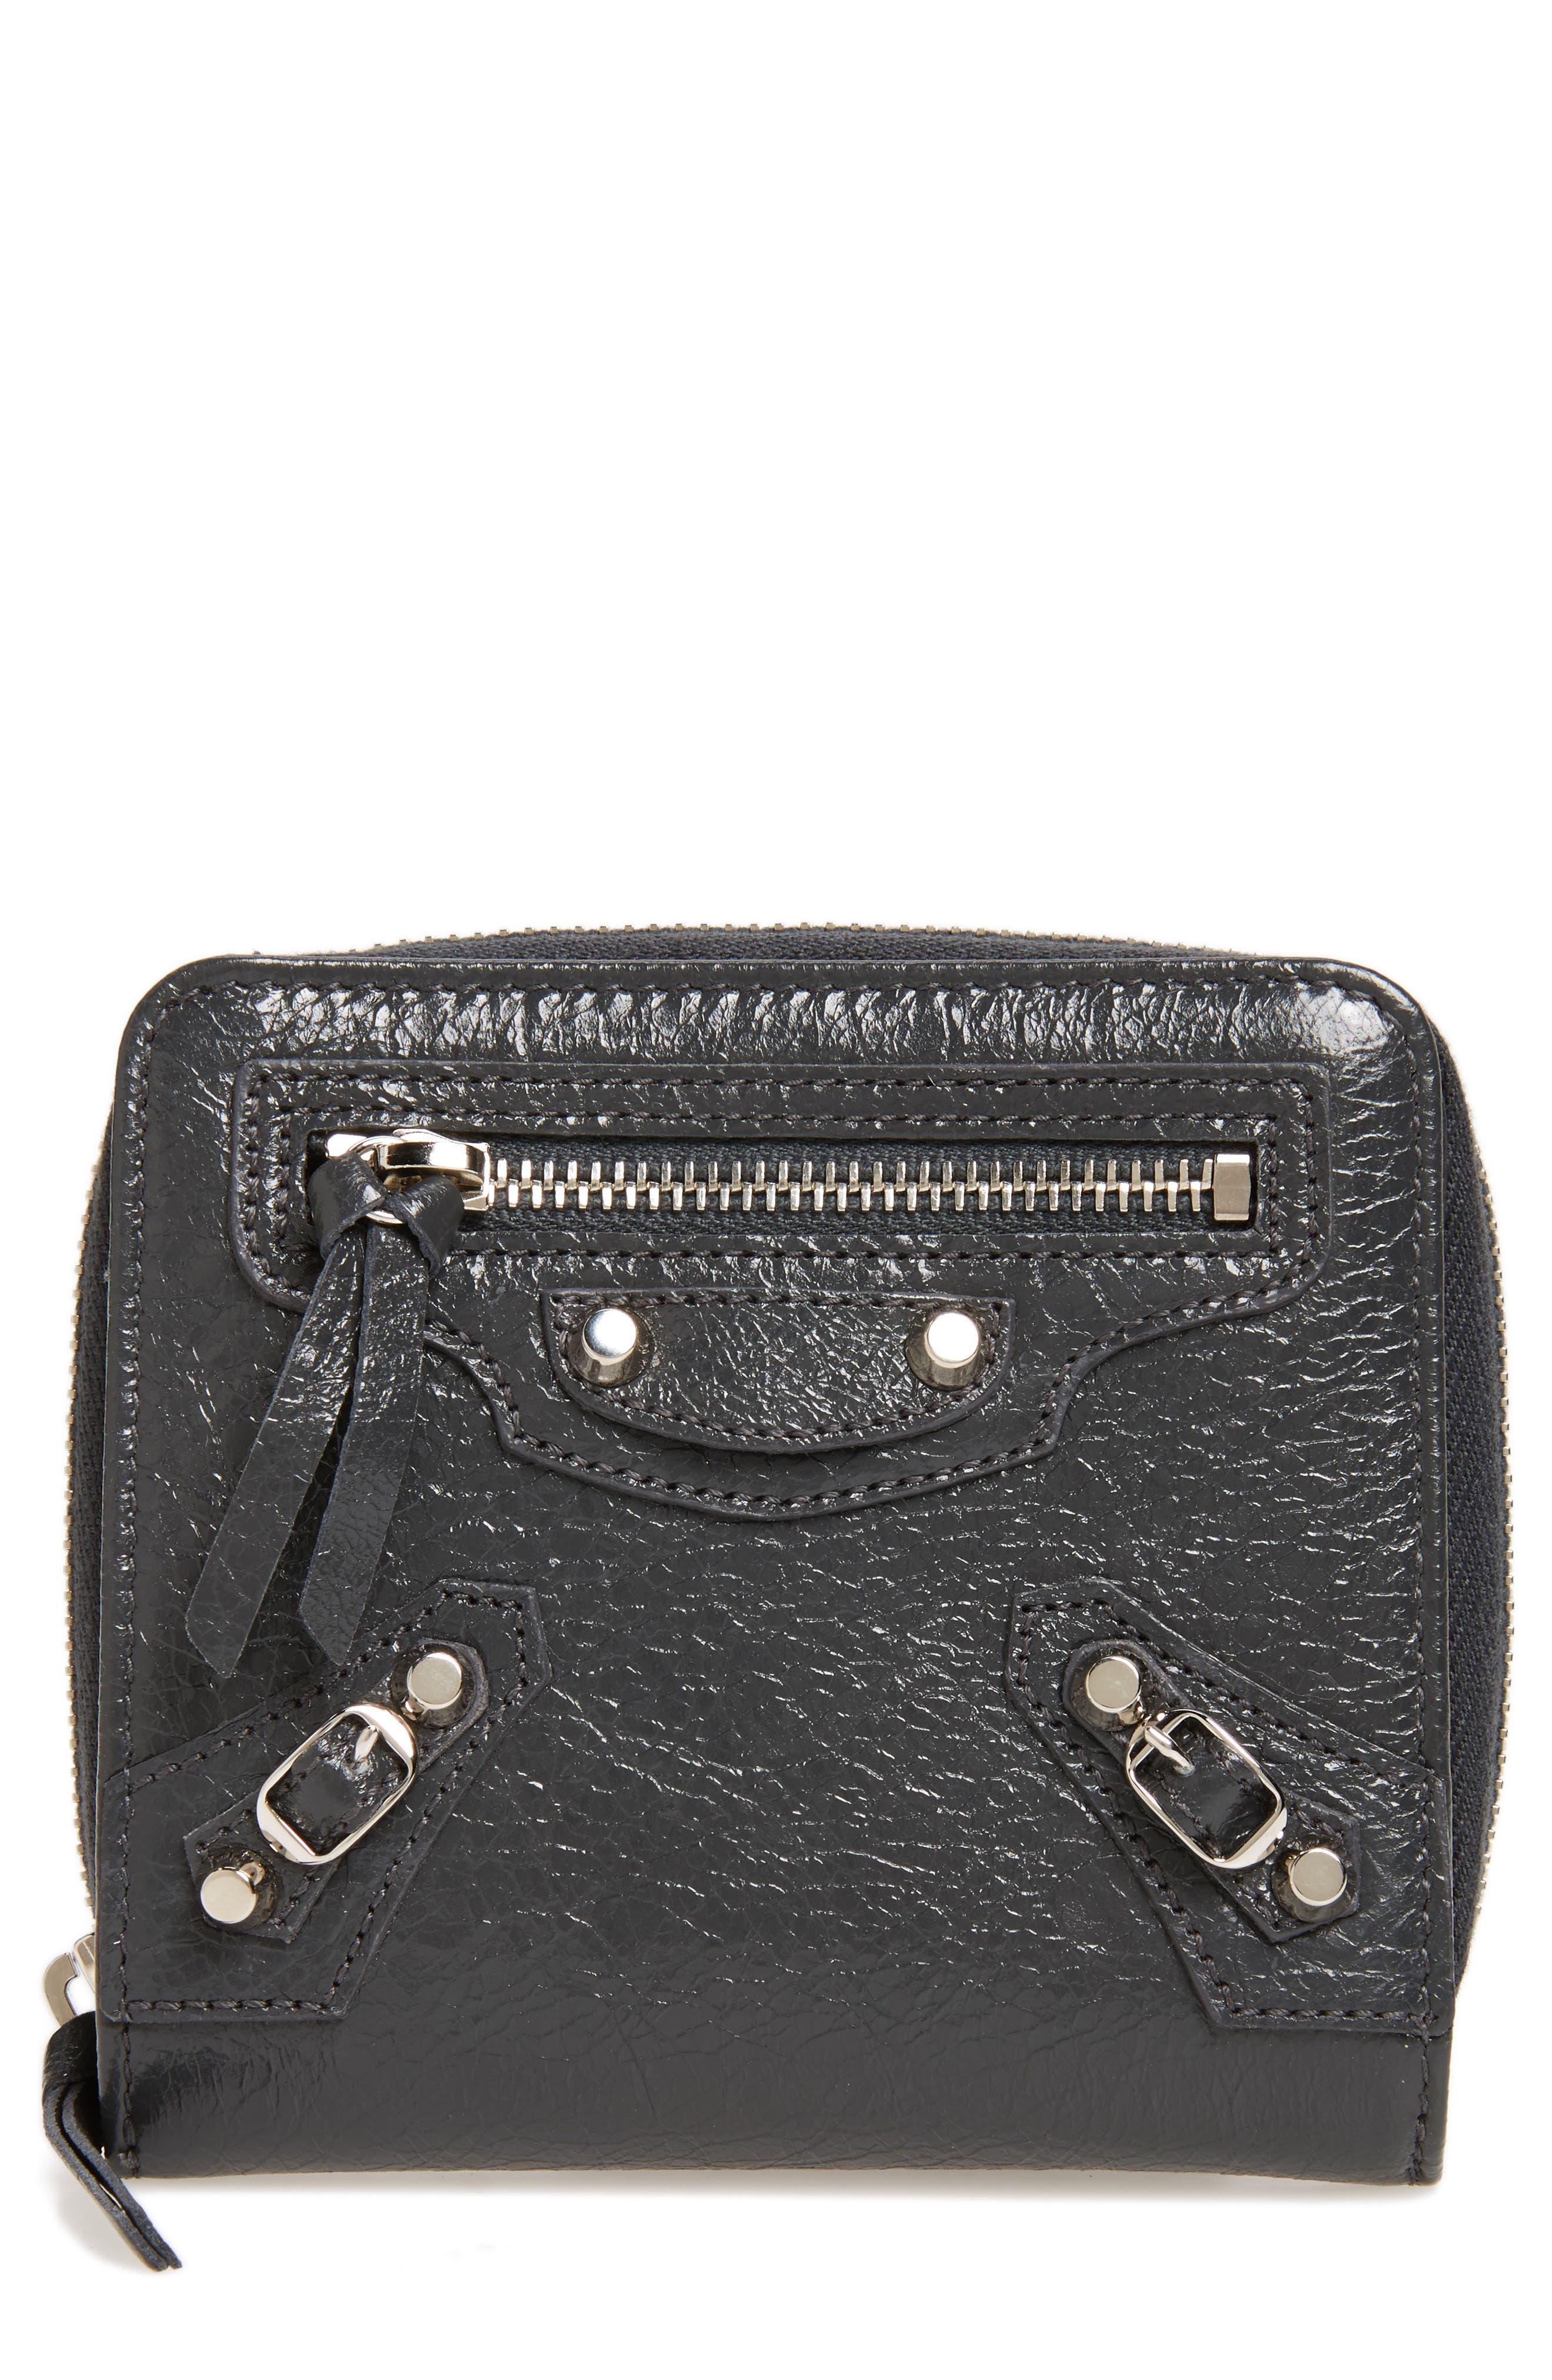 Alternate Image 1 Selected - Balenciaga Classic Leather Billfold